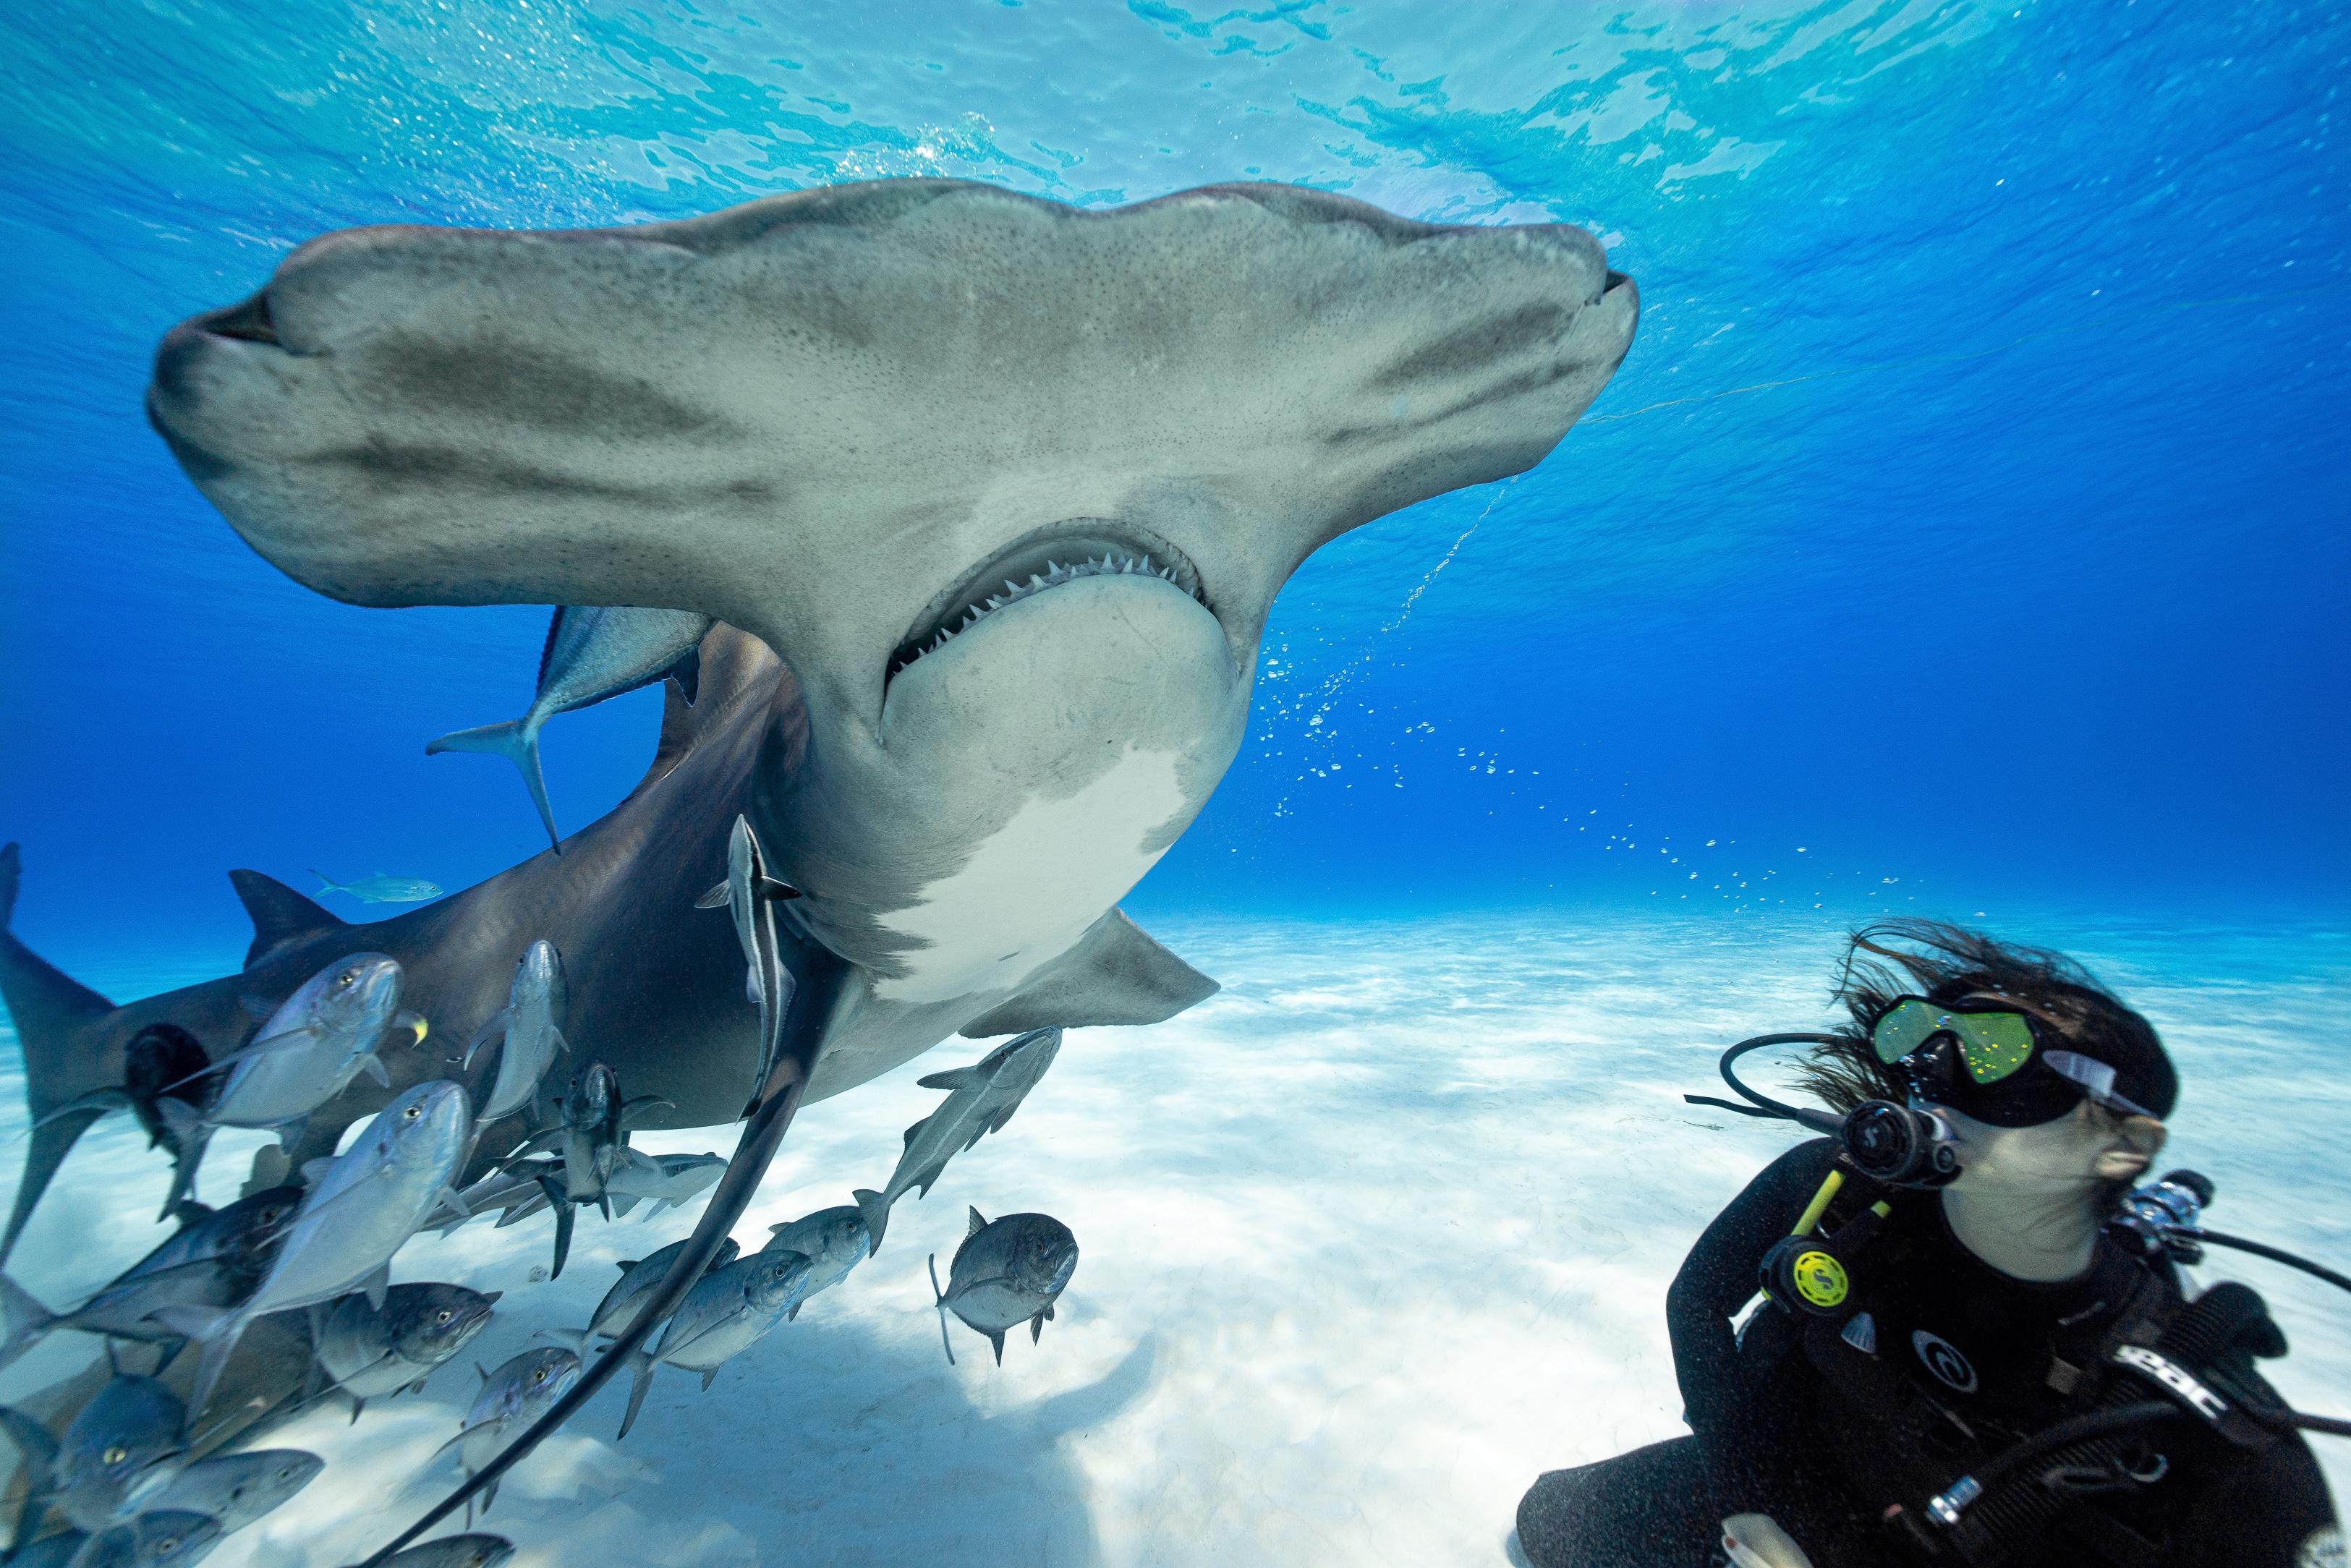 female scuba diver next to a great hammerhead shark